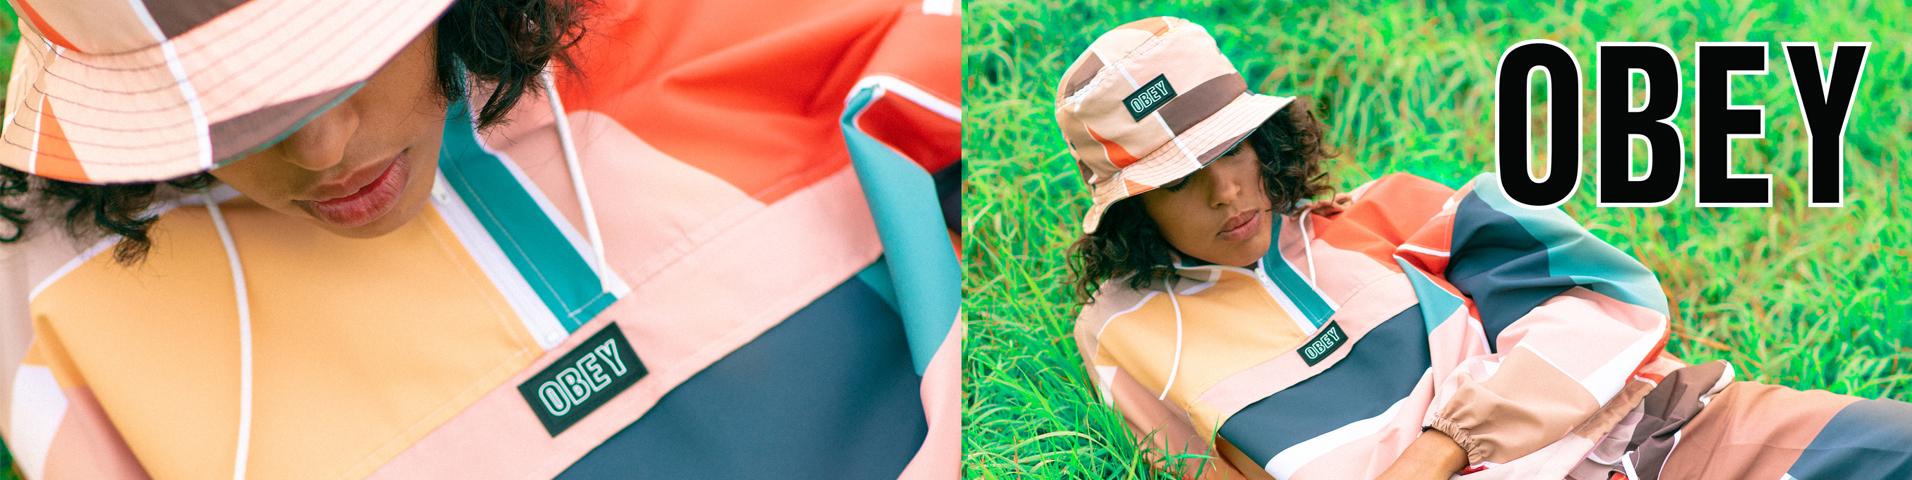 Cappelli da donna Obey Clothing  4d81a45eea4f